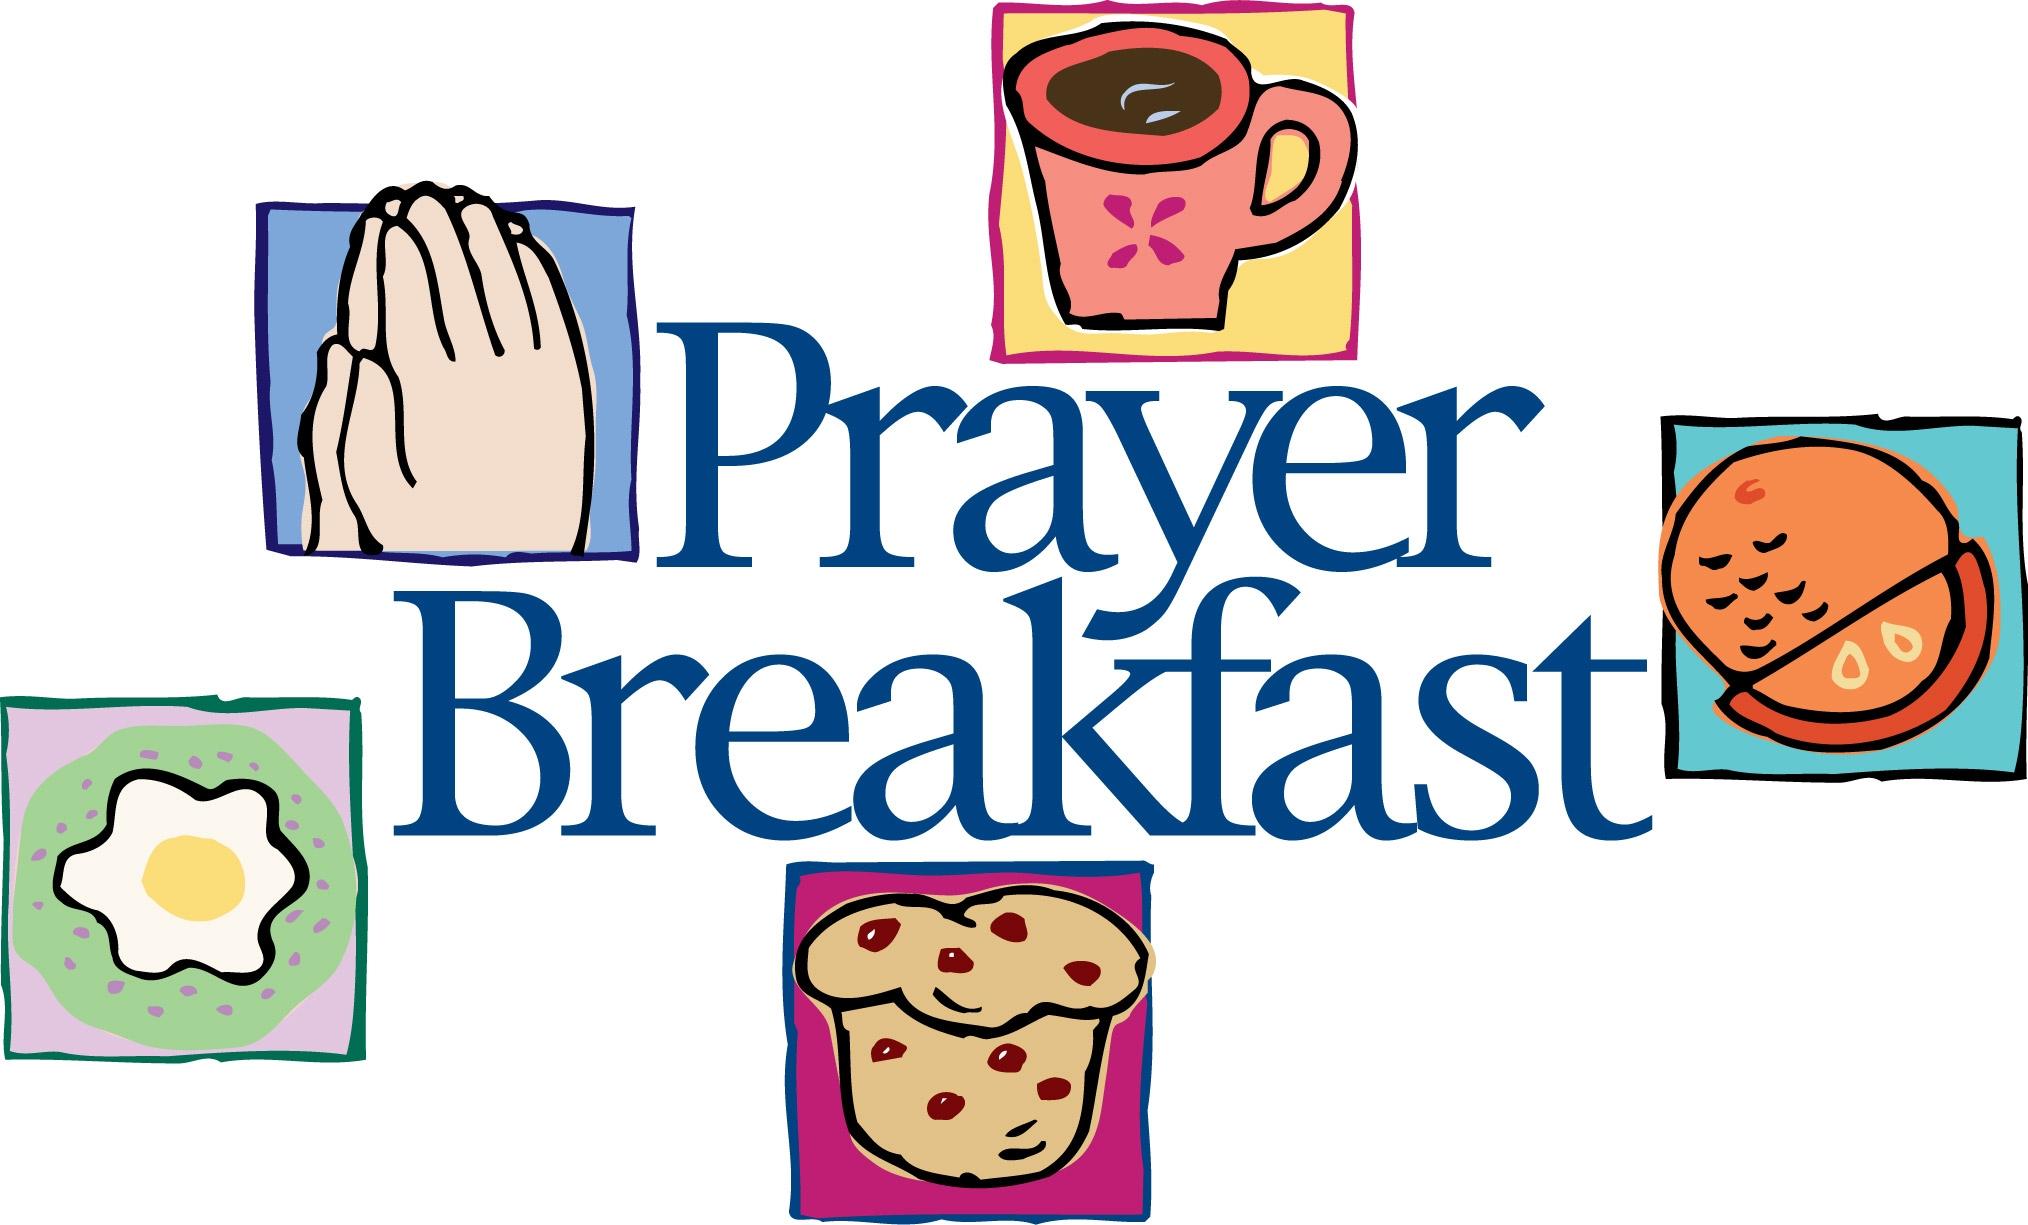 Ladies st david s. Breakfast clipart prayer breakfast